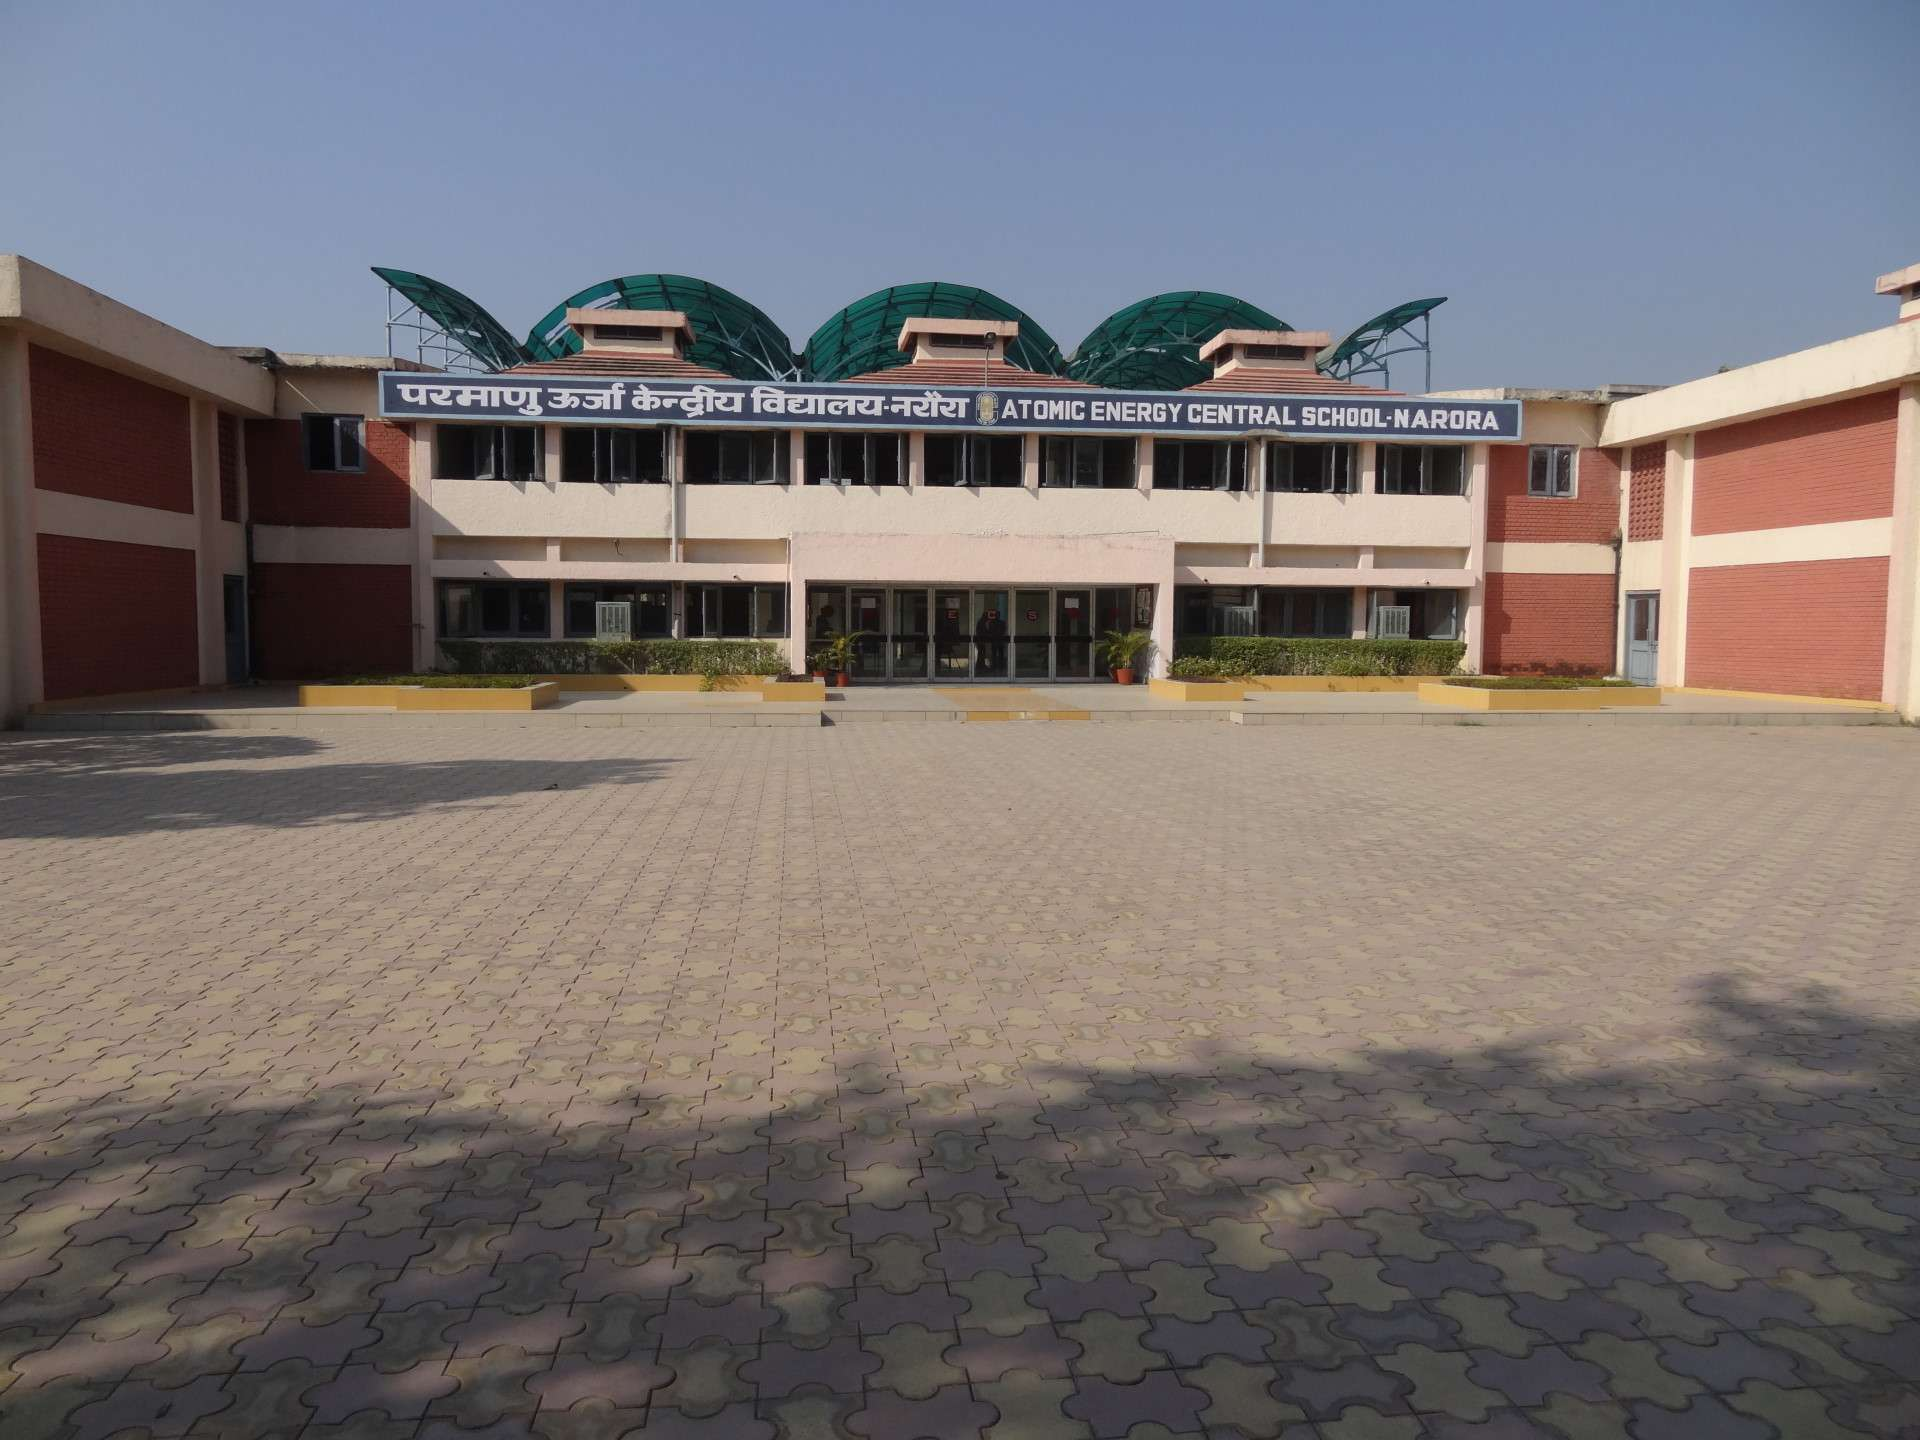 ATOMIC ENERGY CENTRAL SCHOOL NAPP TOWNSHIP NARORA BULANDSHAHR UTTAR PRADESH 2130041